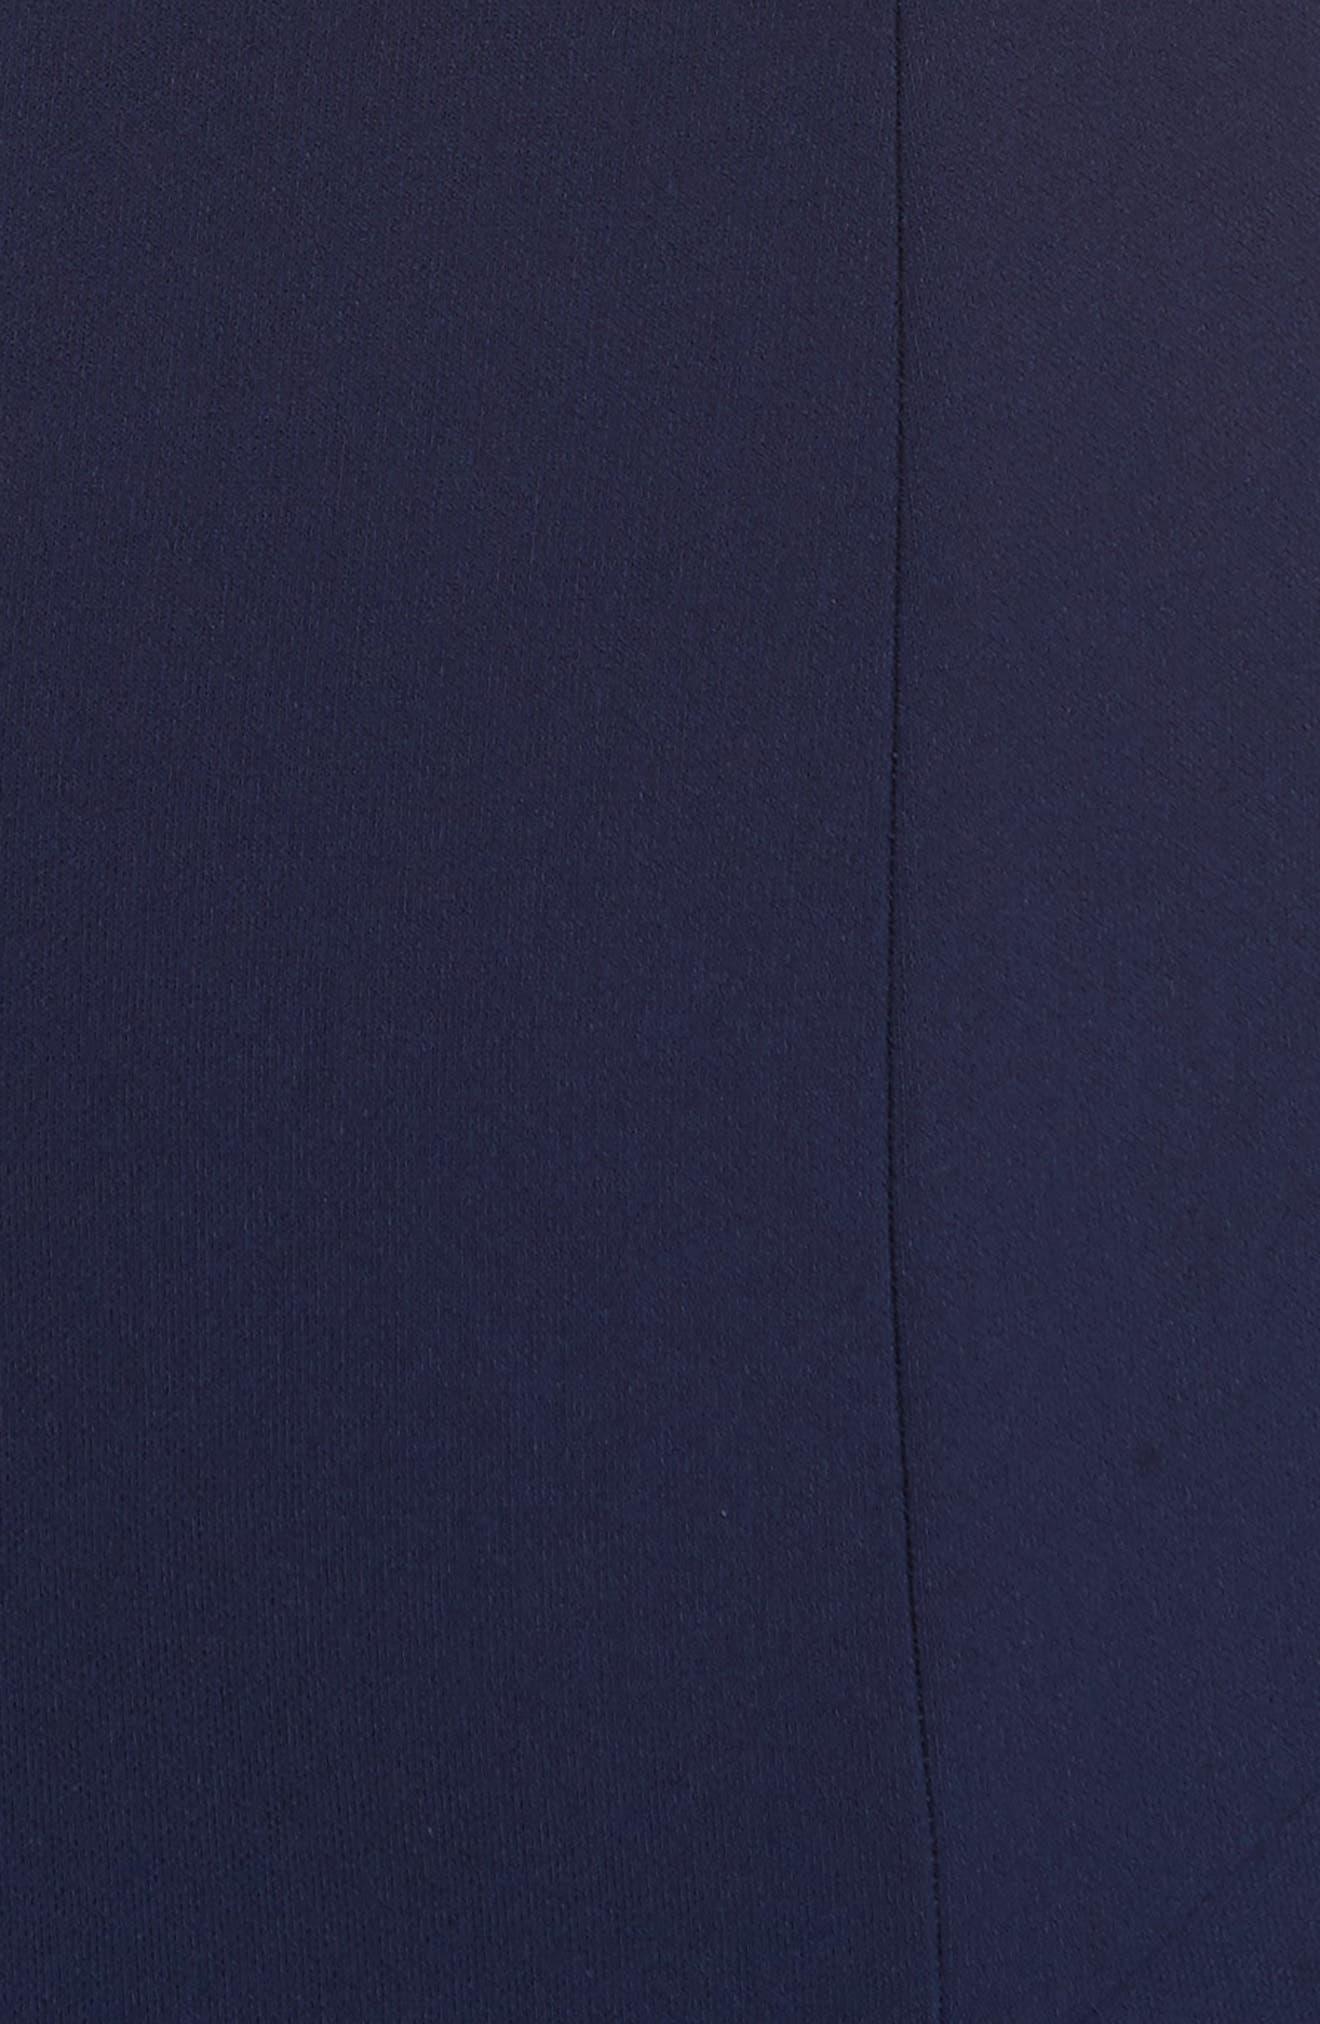 Dev Ruffle Fit & Flare Dress,                             Alternate thumbnail 5, color,                             Blue Violet/ Black